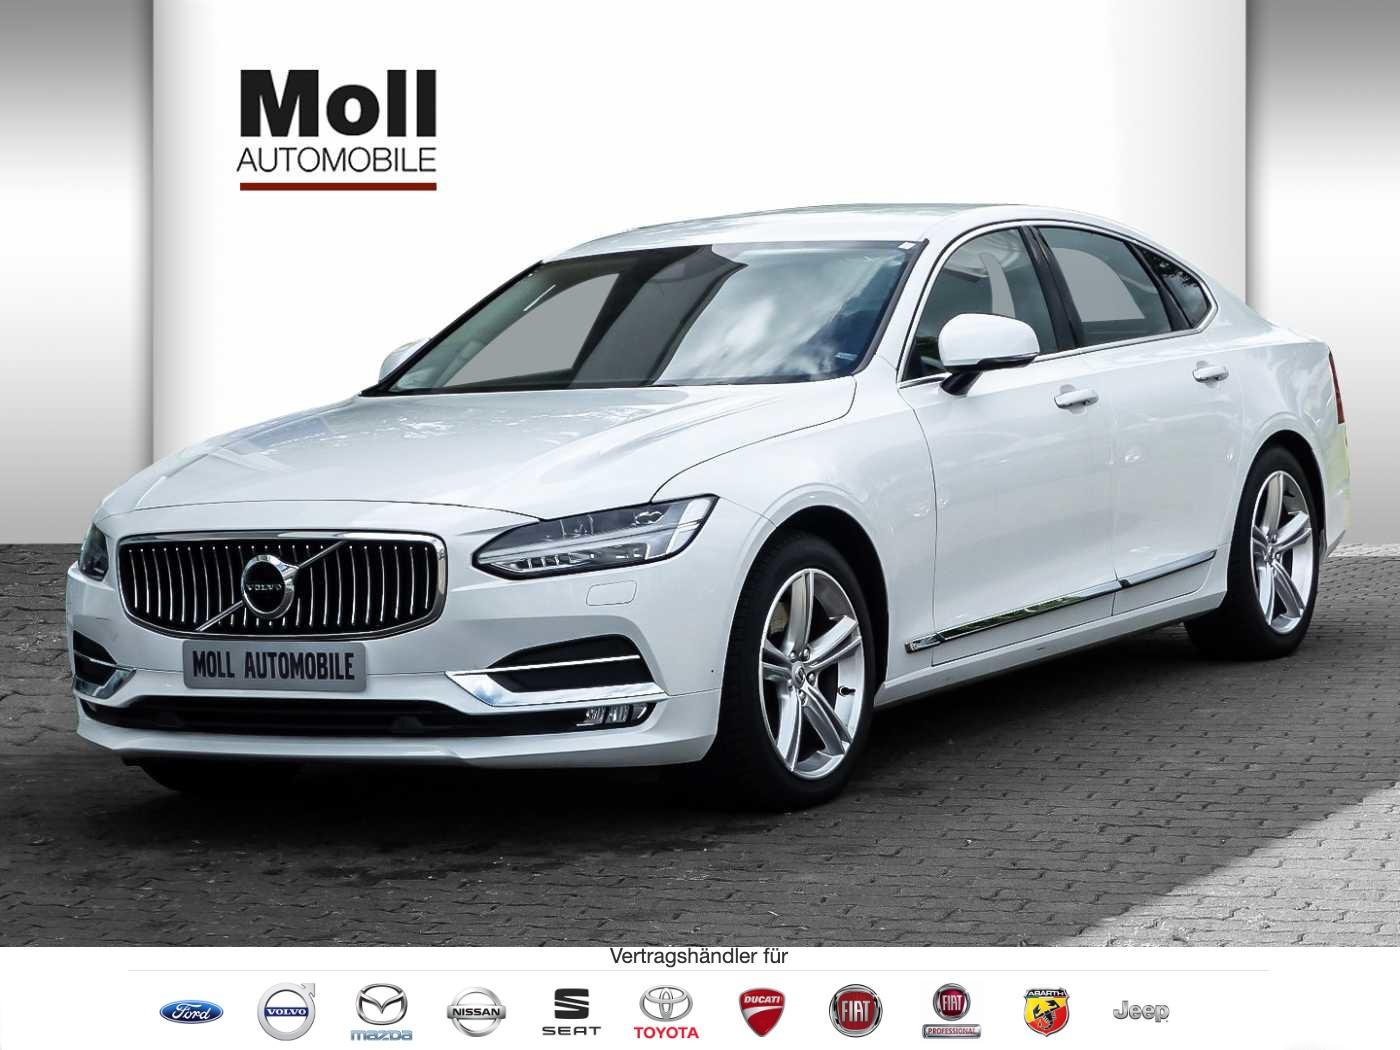 Volvo S90 T4 Geartronic Inscription Navi LED Kamera, Jahr 2018, Benzin